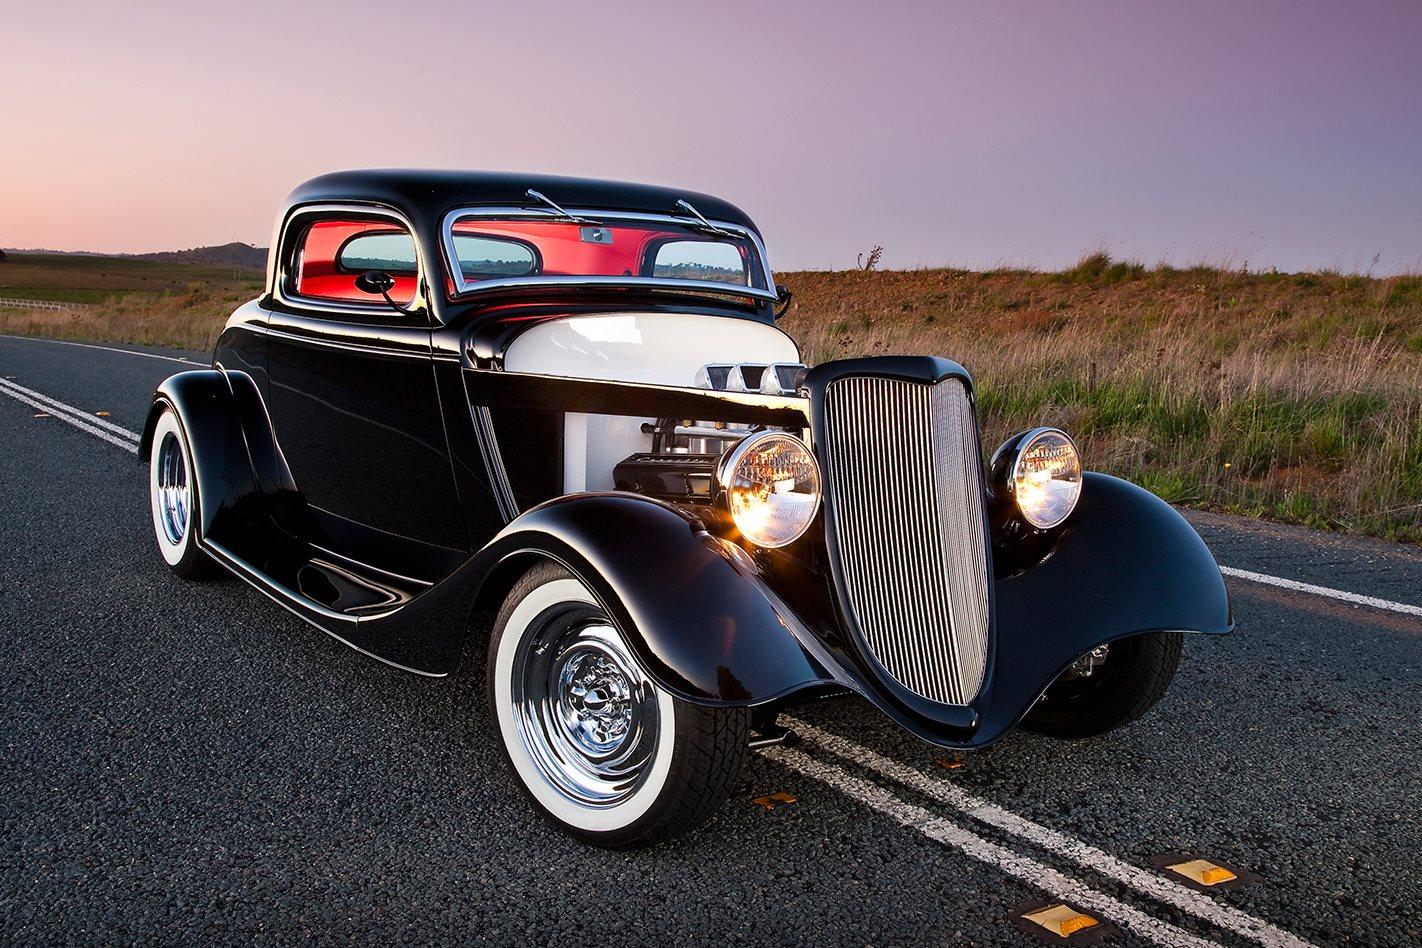 454ci 1934 Ford Three Window Coupe